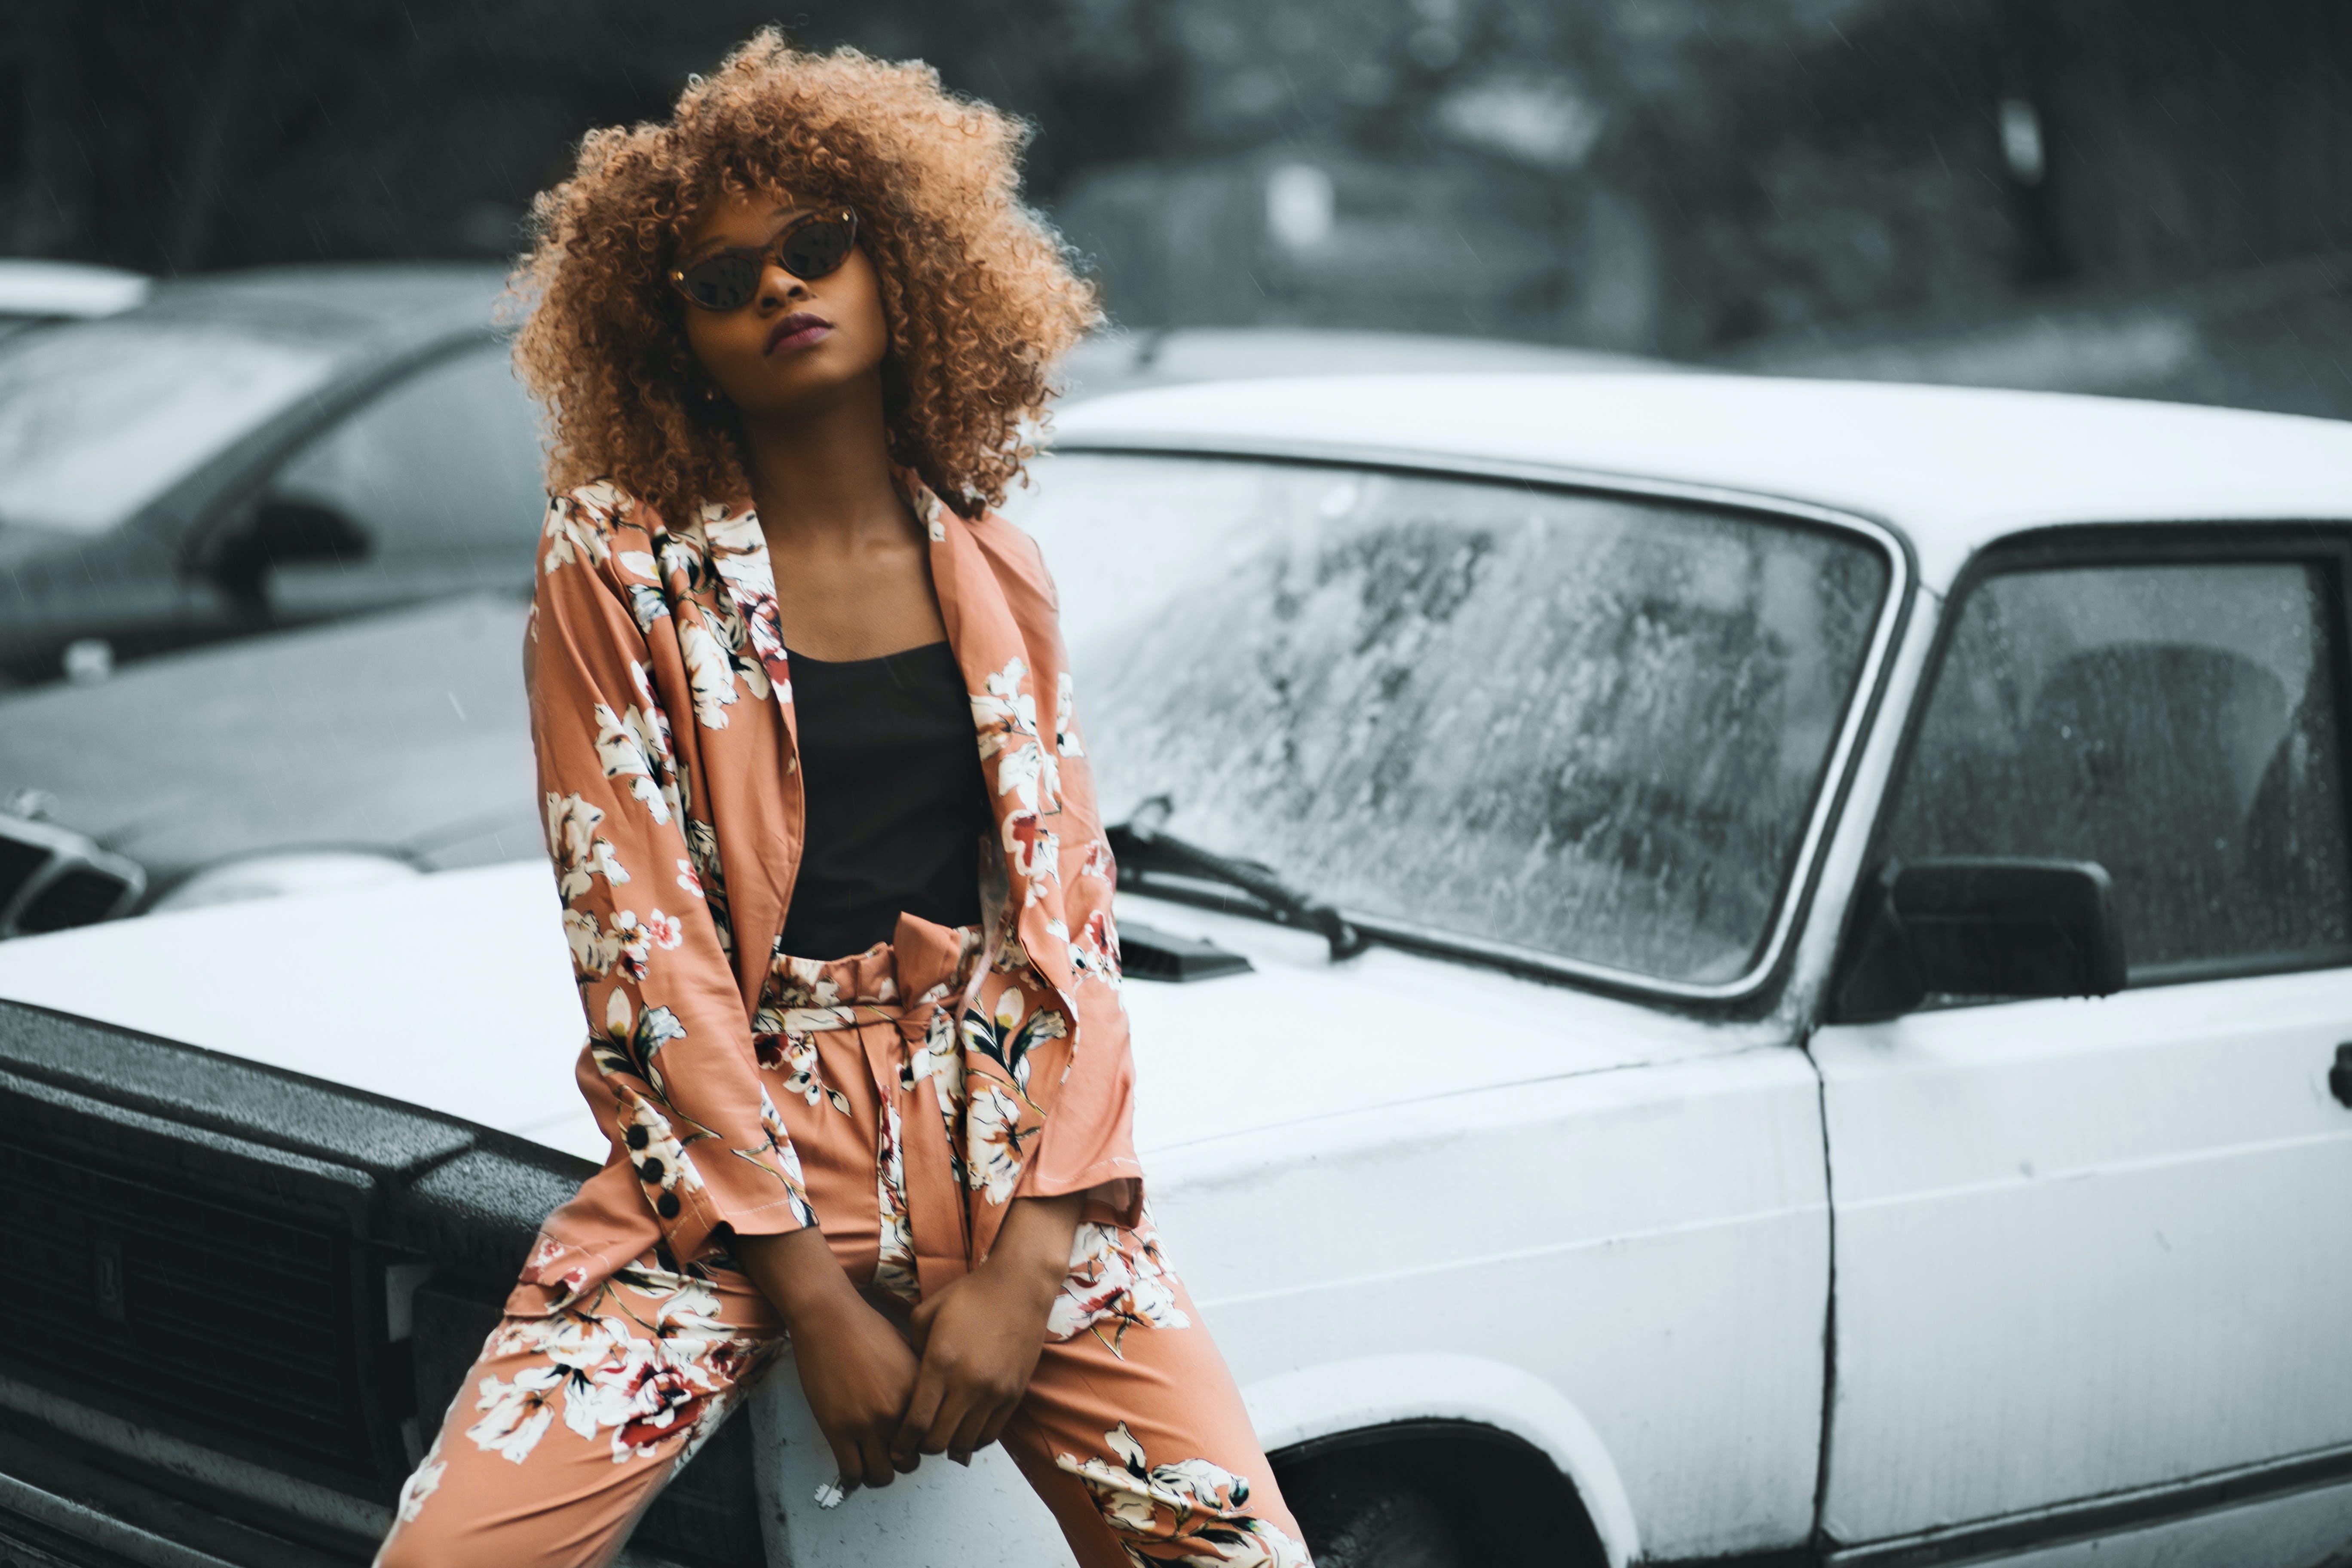 Free stock photo of model, car, photo, blogger